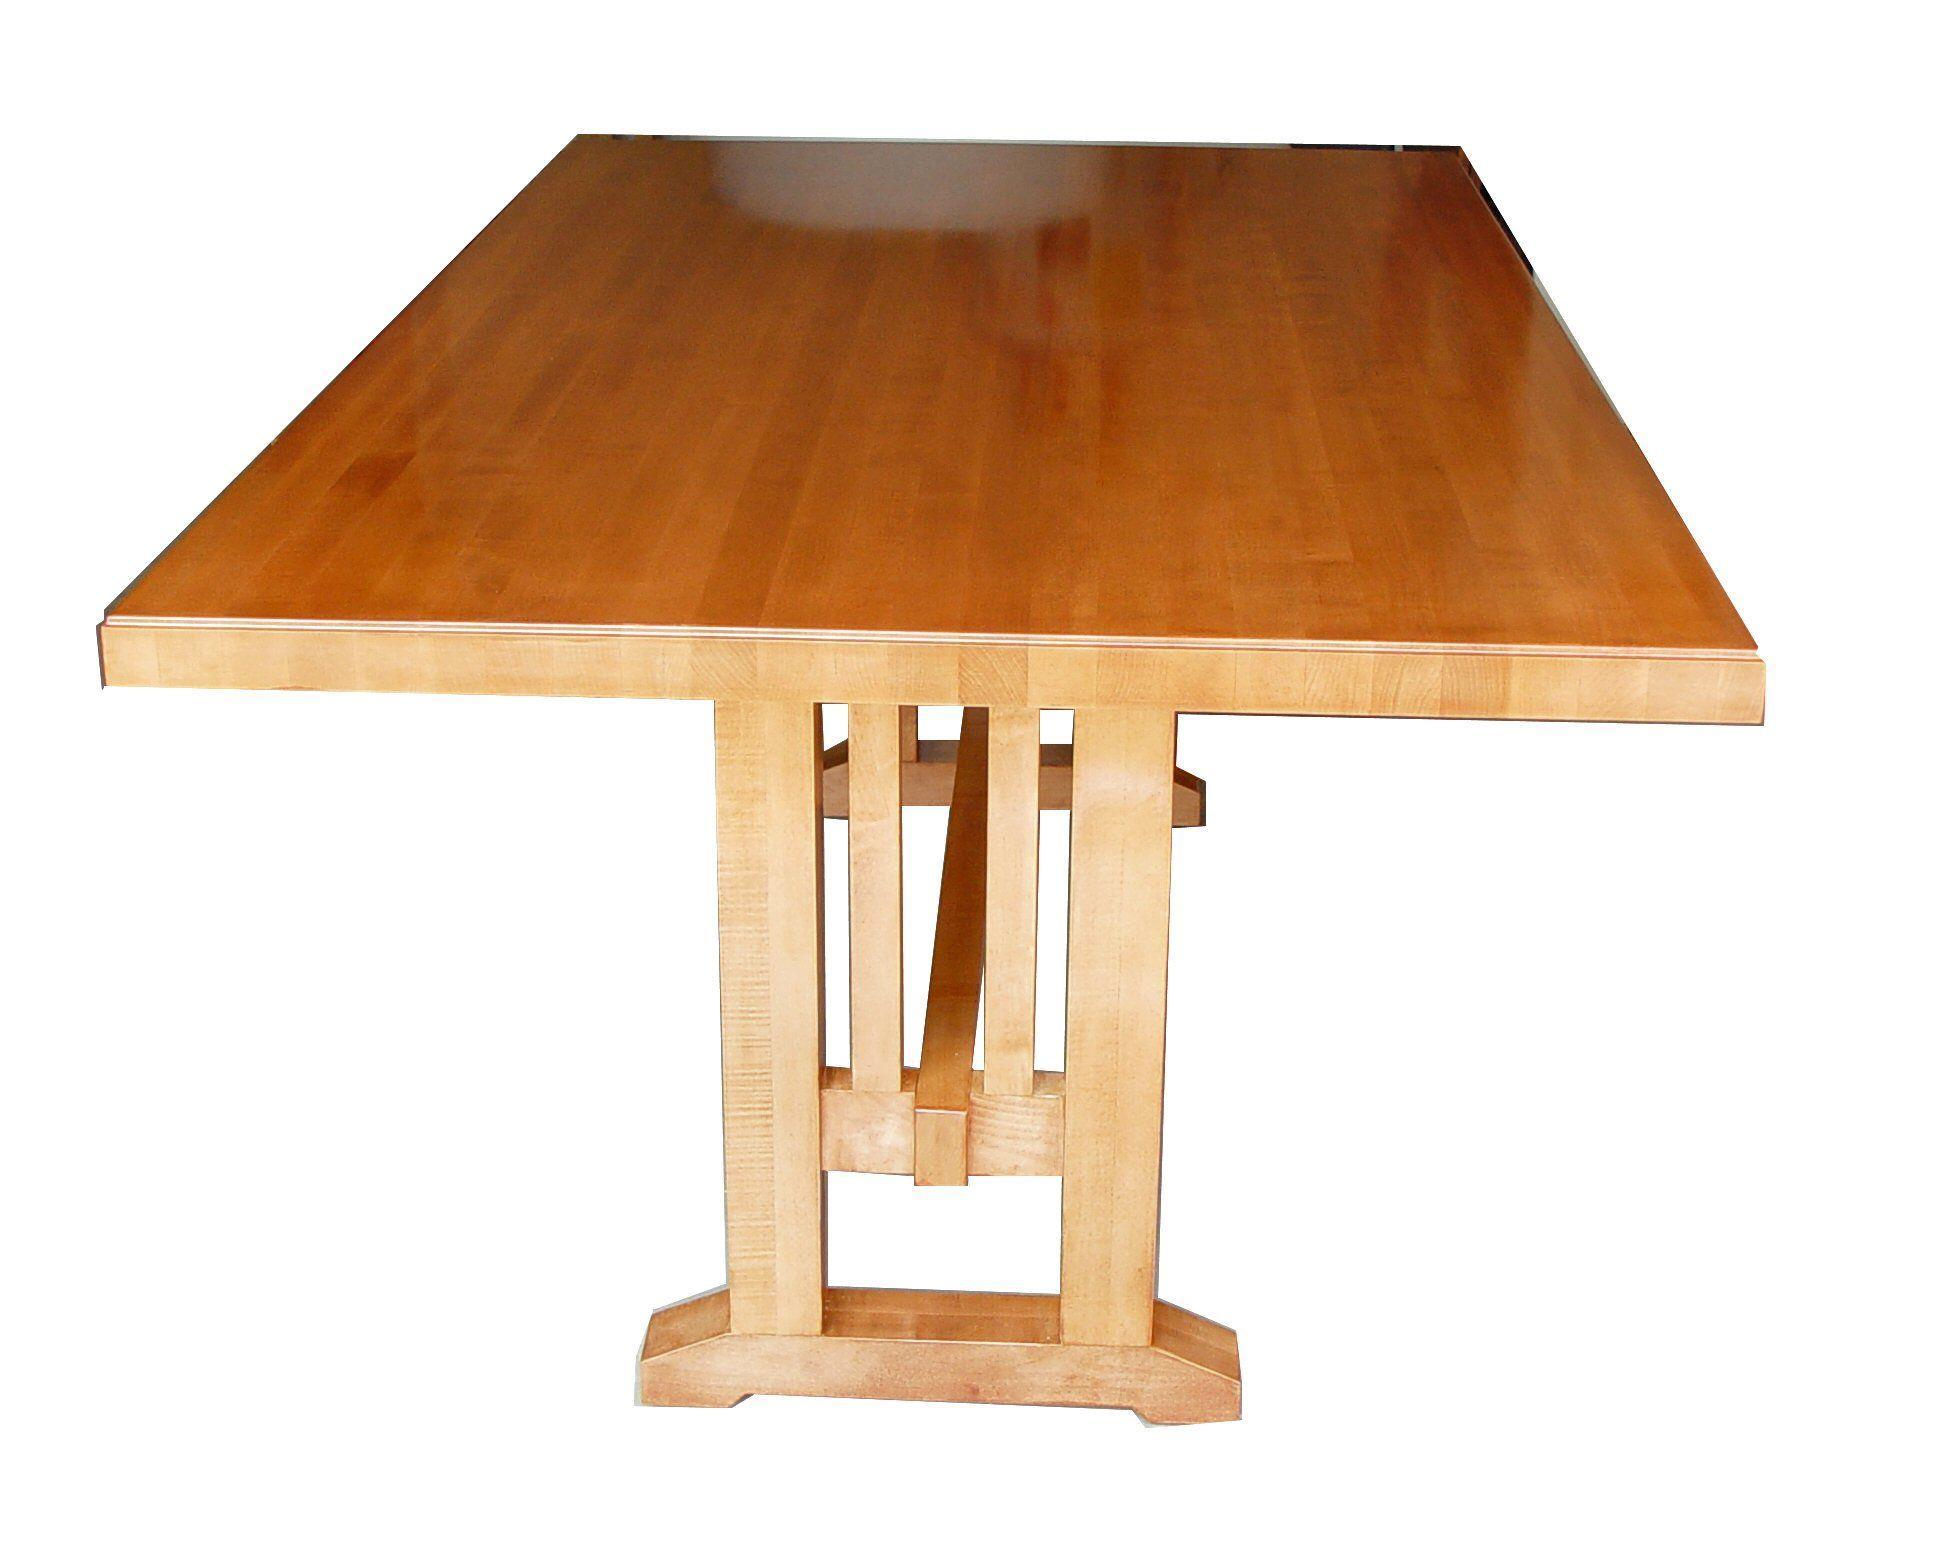 DeVos Custom Woodworking - Custom Trestle Style Tables